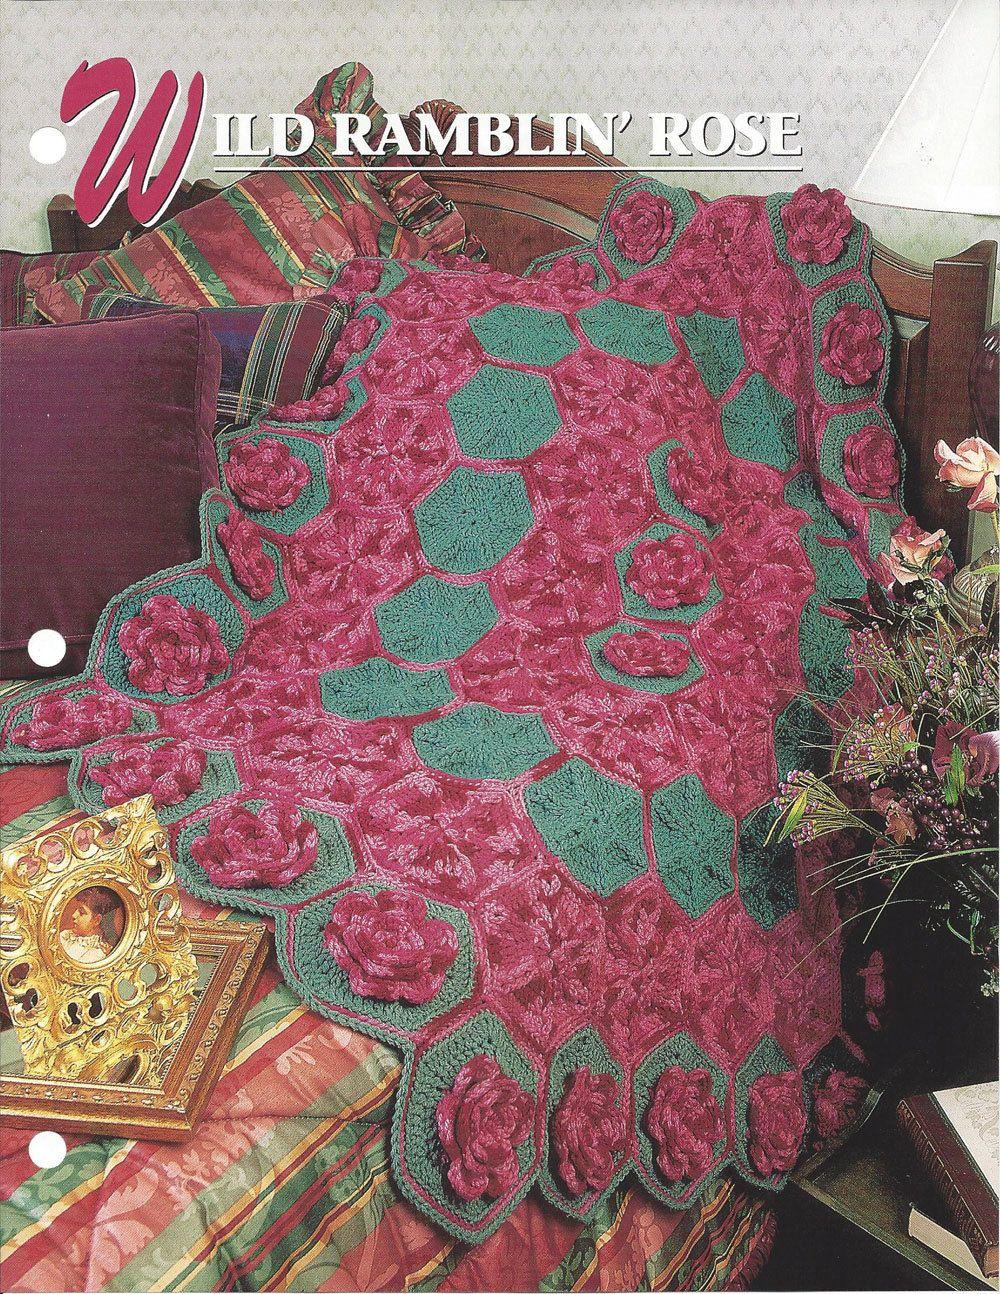 ✿  ✿ Silvestres Sinuosos de Rosa Crochê Coberta Acolchoada Malha itens decorativos Criações -  /  ✿  ✿ Wild Rambling Rose Crochet Quilt Knit Knacks Creations -